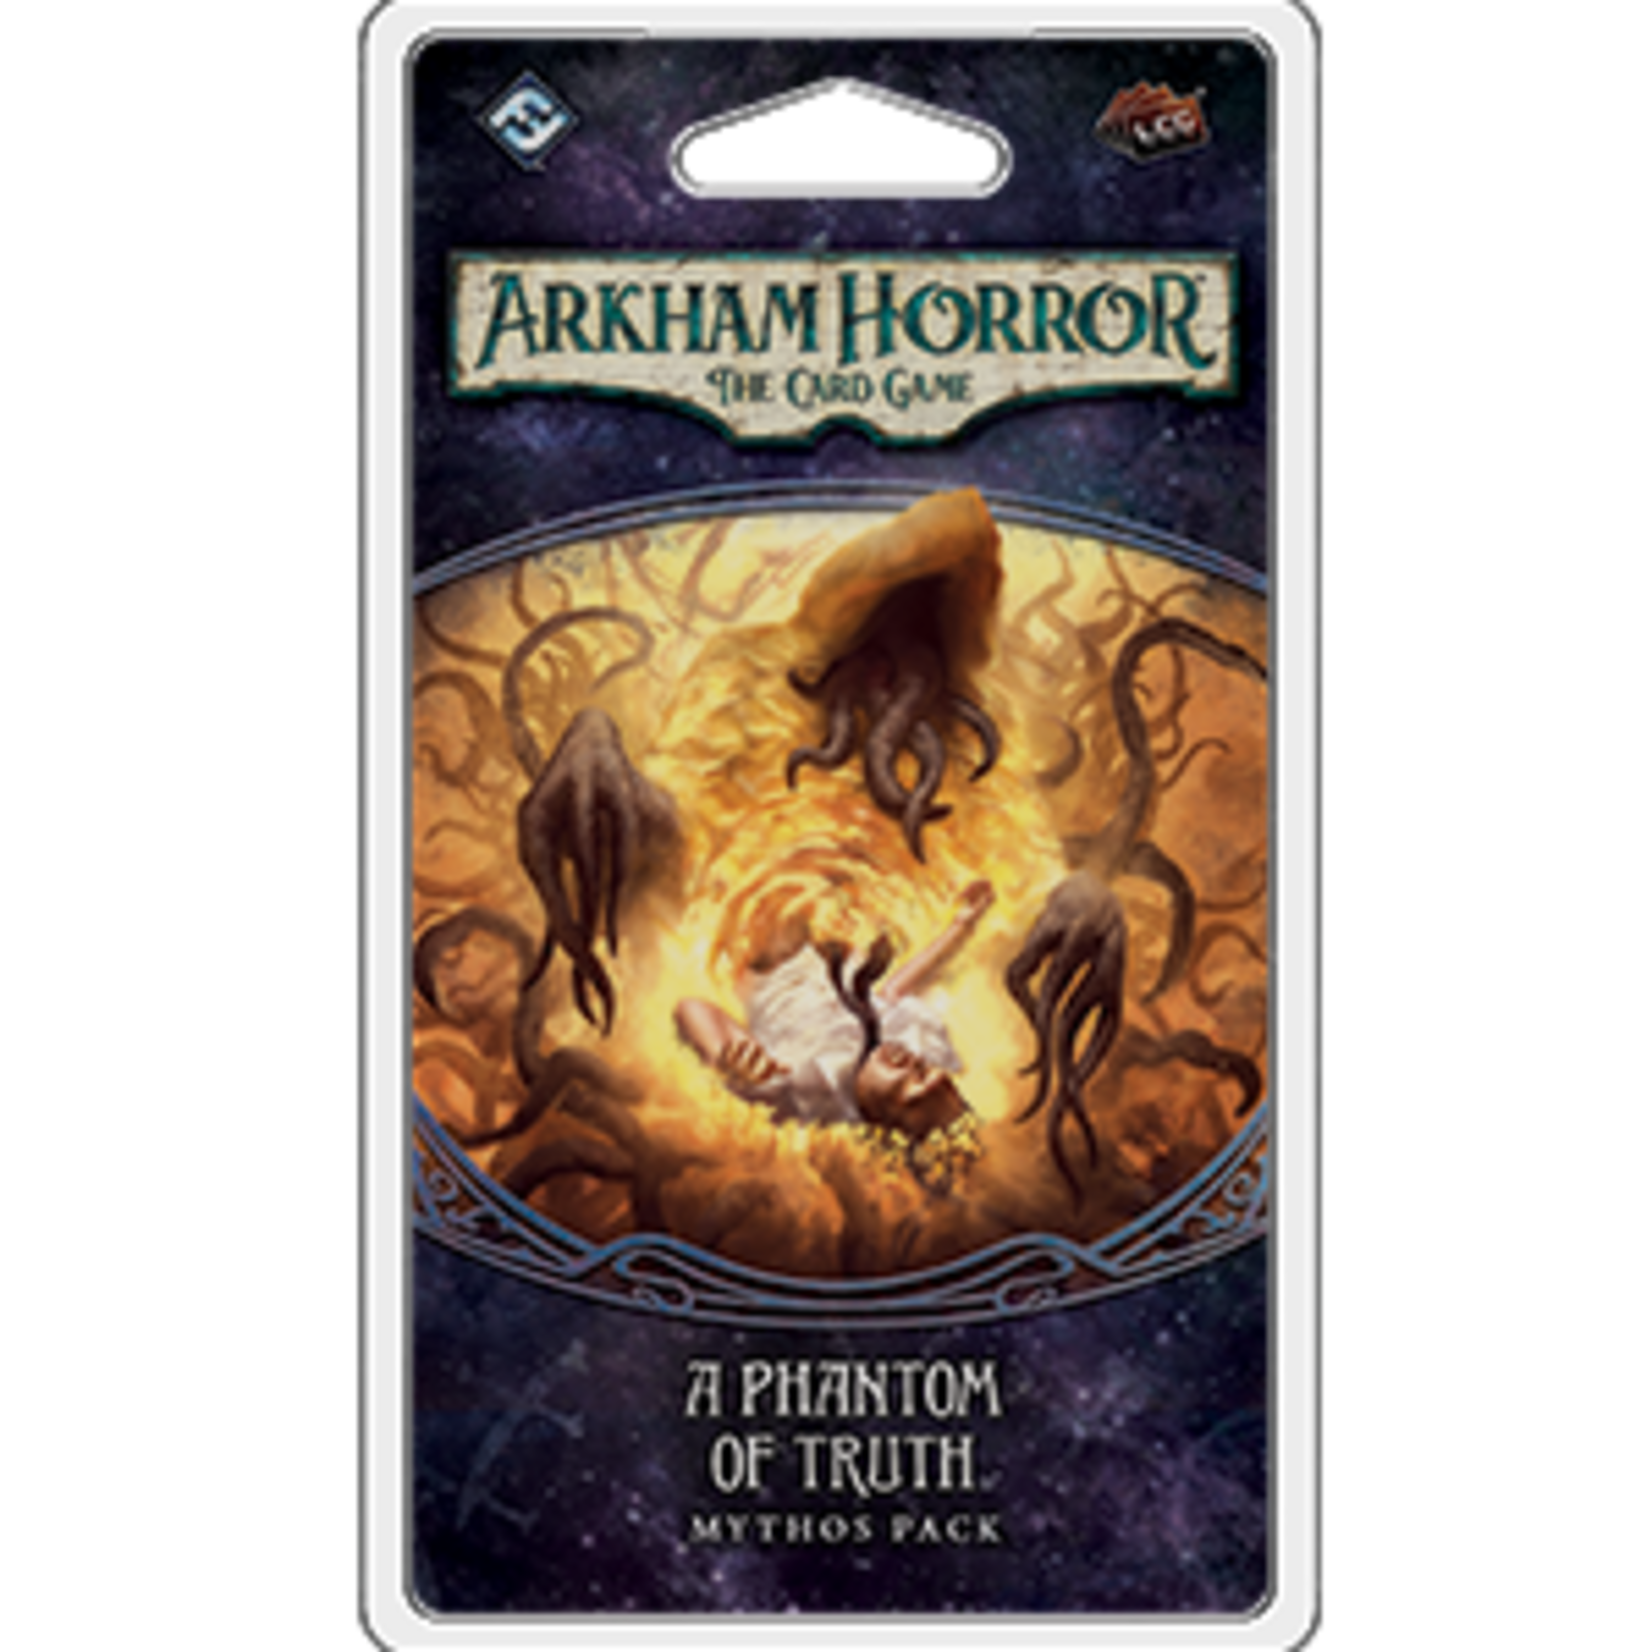 Fantasy Flight Games Arkham Horror The Card Game: A Phantom of Truth